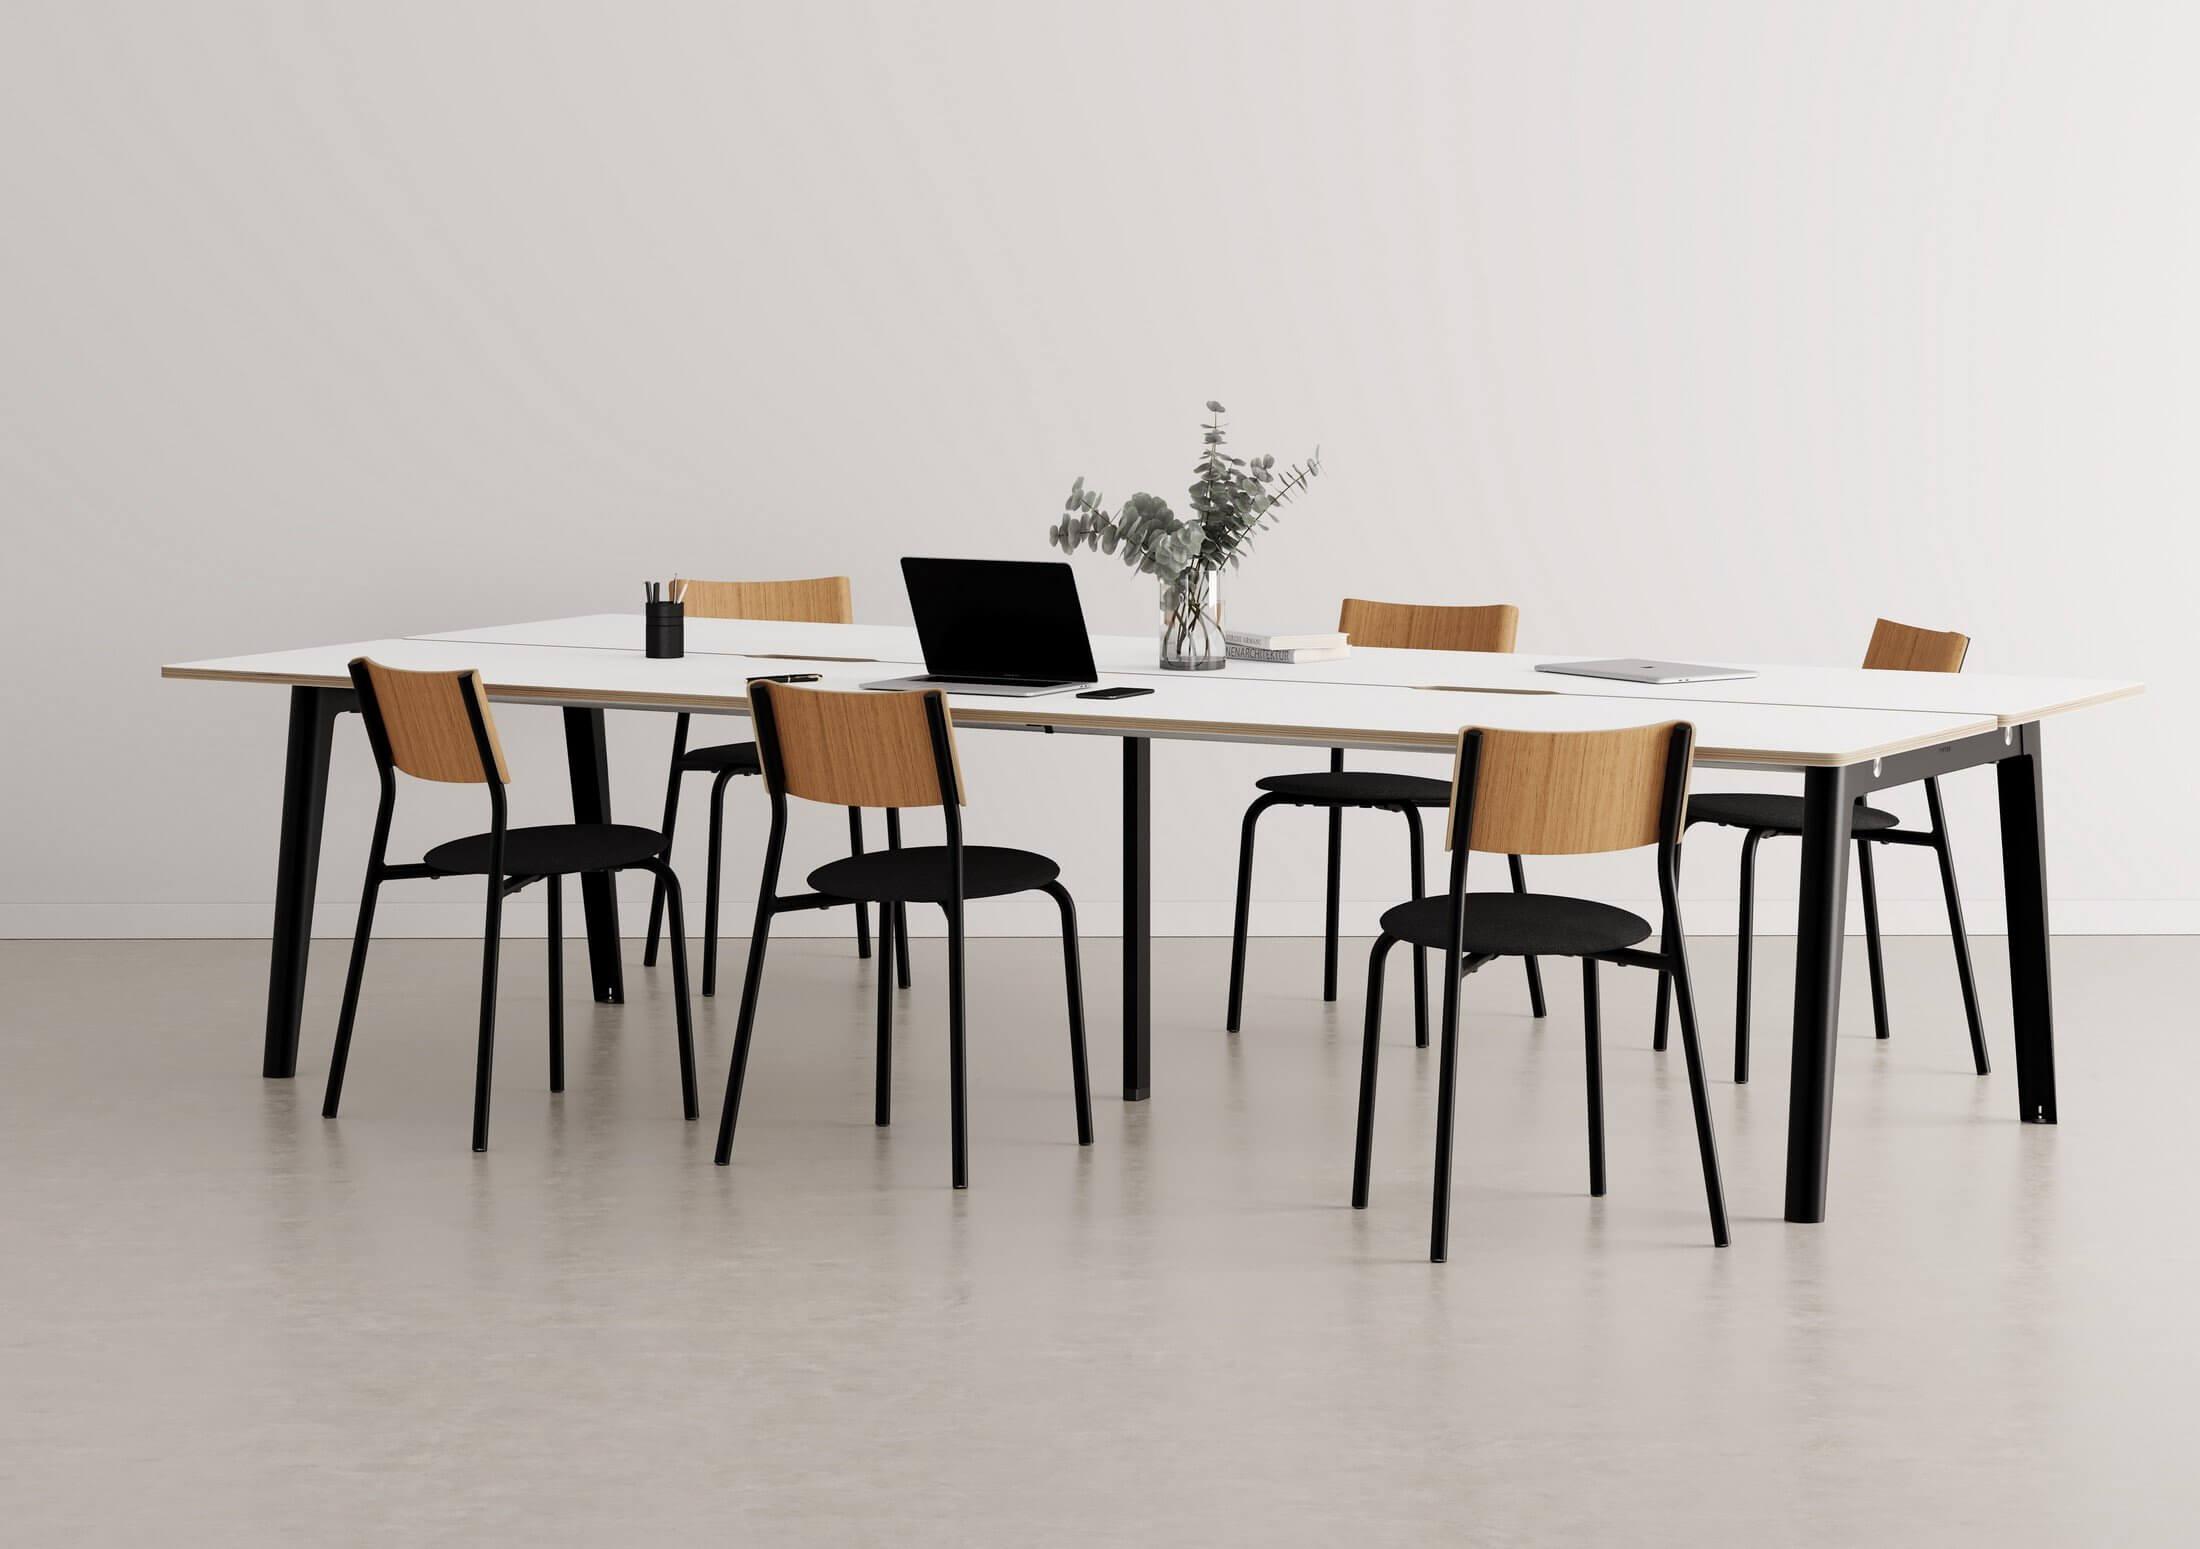 Bureau bench design made in France.